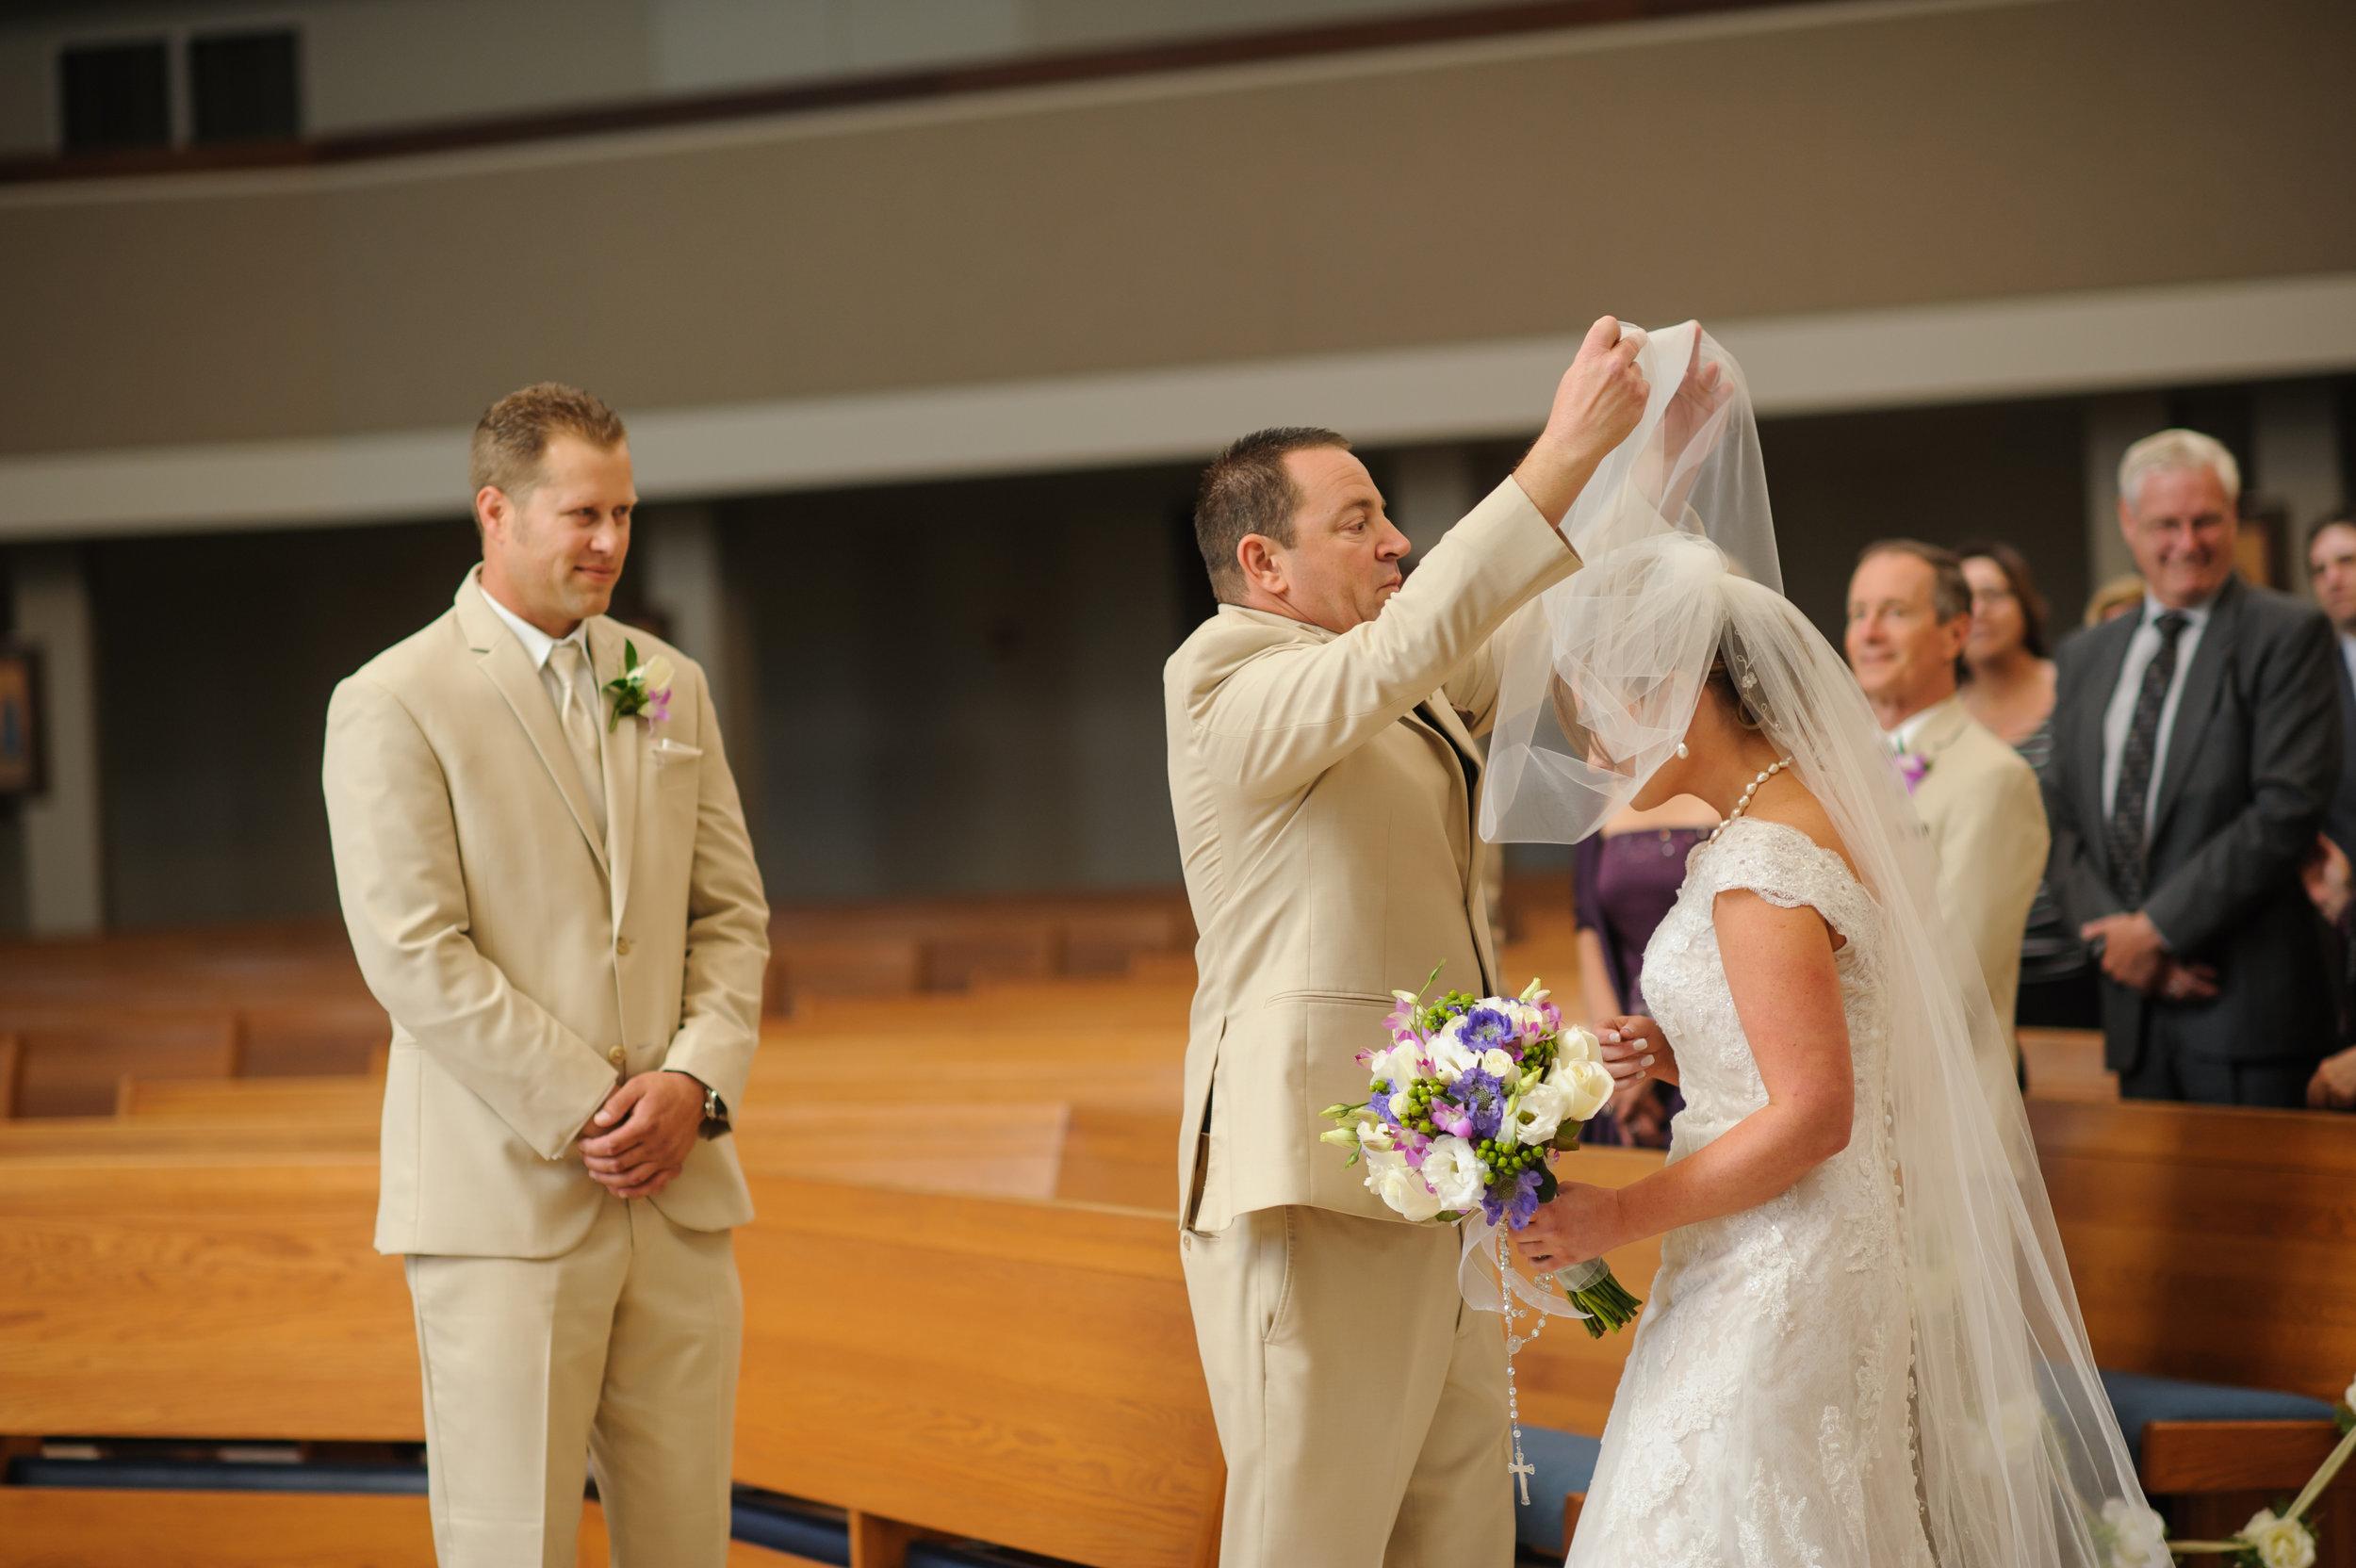 danielle-ross-004-sacramento-wedding-photographer-katherine-nicole-photography.JPG